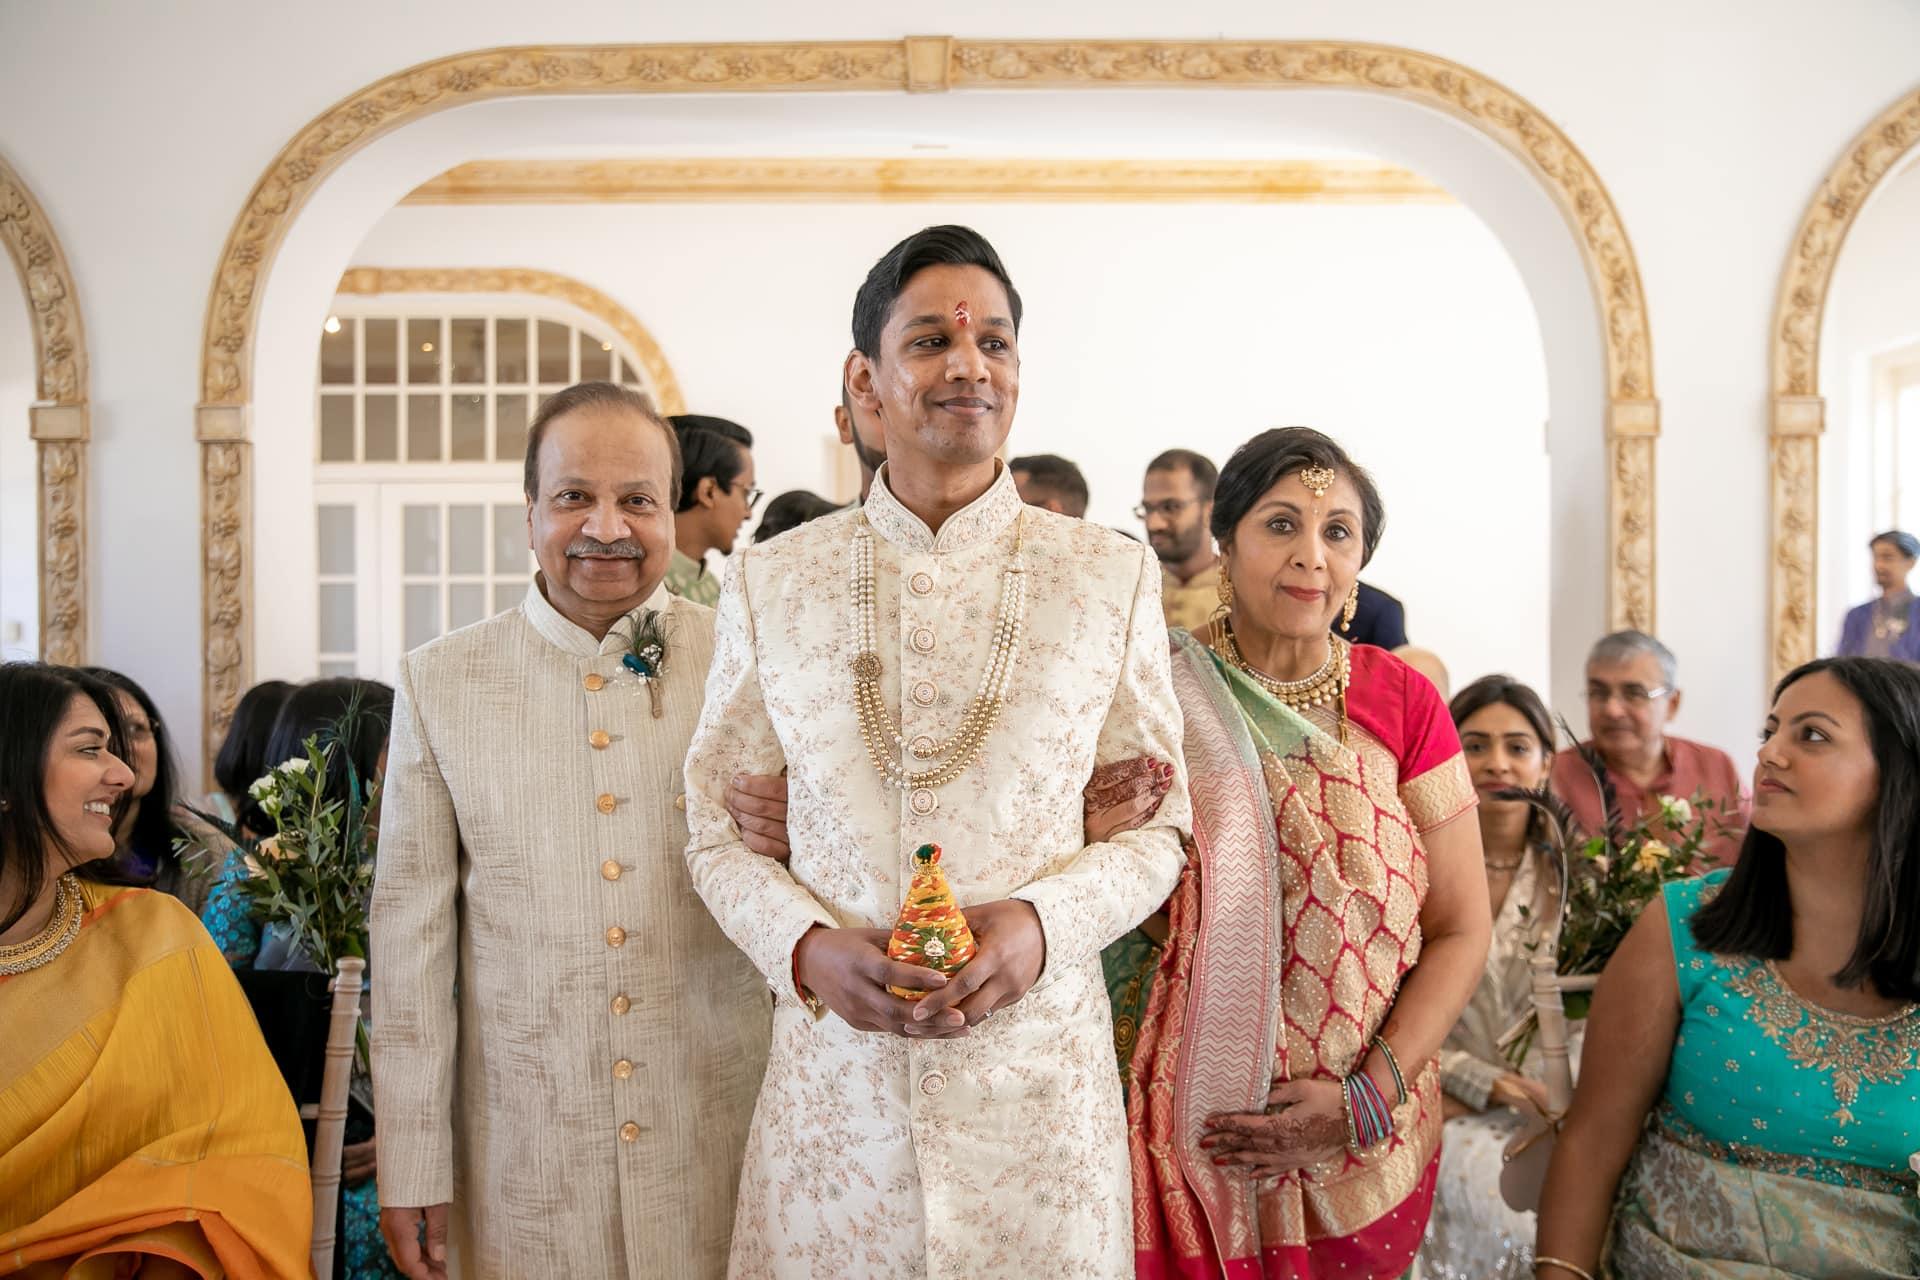 Hindu groom walking down the isle with bride's parents